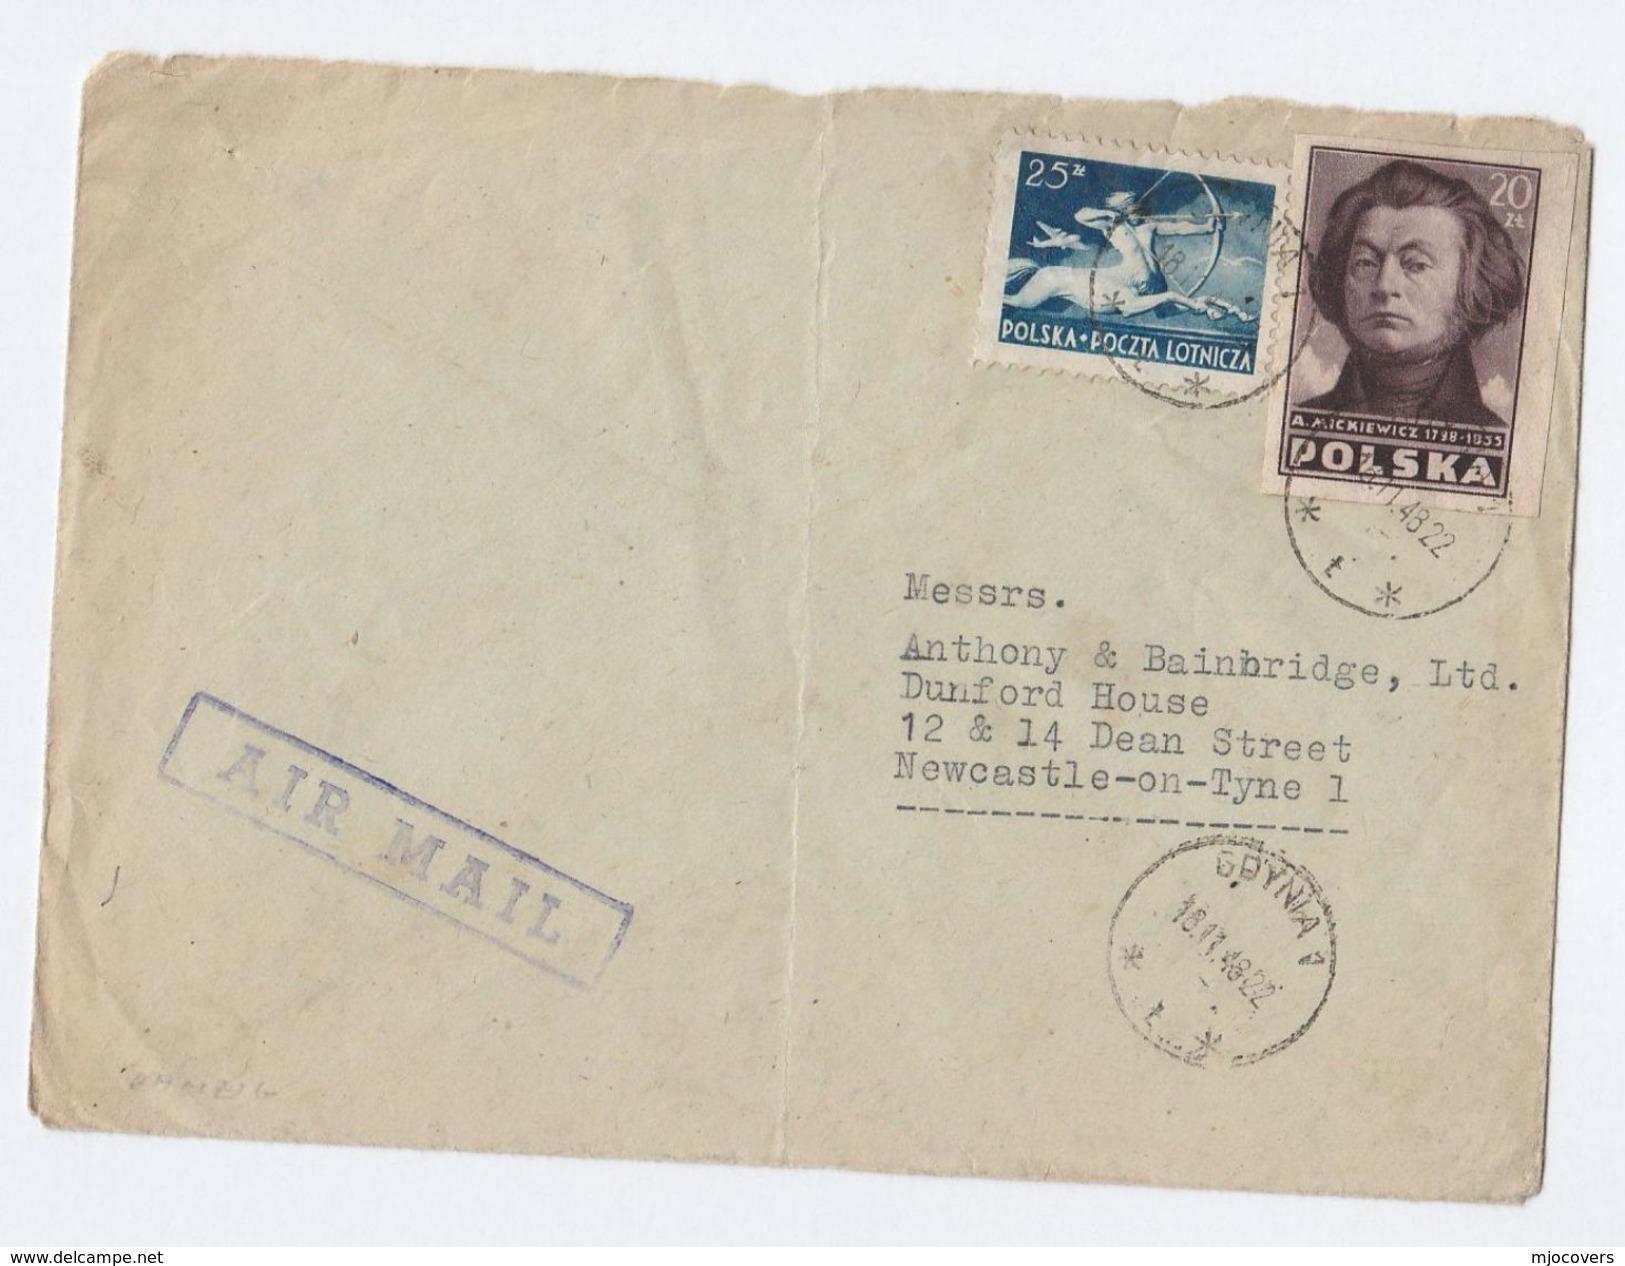 1948 Gdynia POLAND COVER Stamps 25z AIRMAIL Archery 20z Mickiewicz Imperf To GB - Covers & Documents